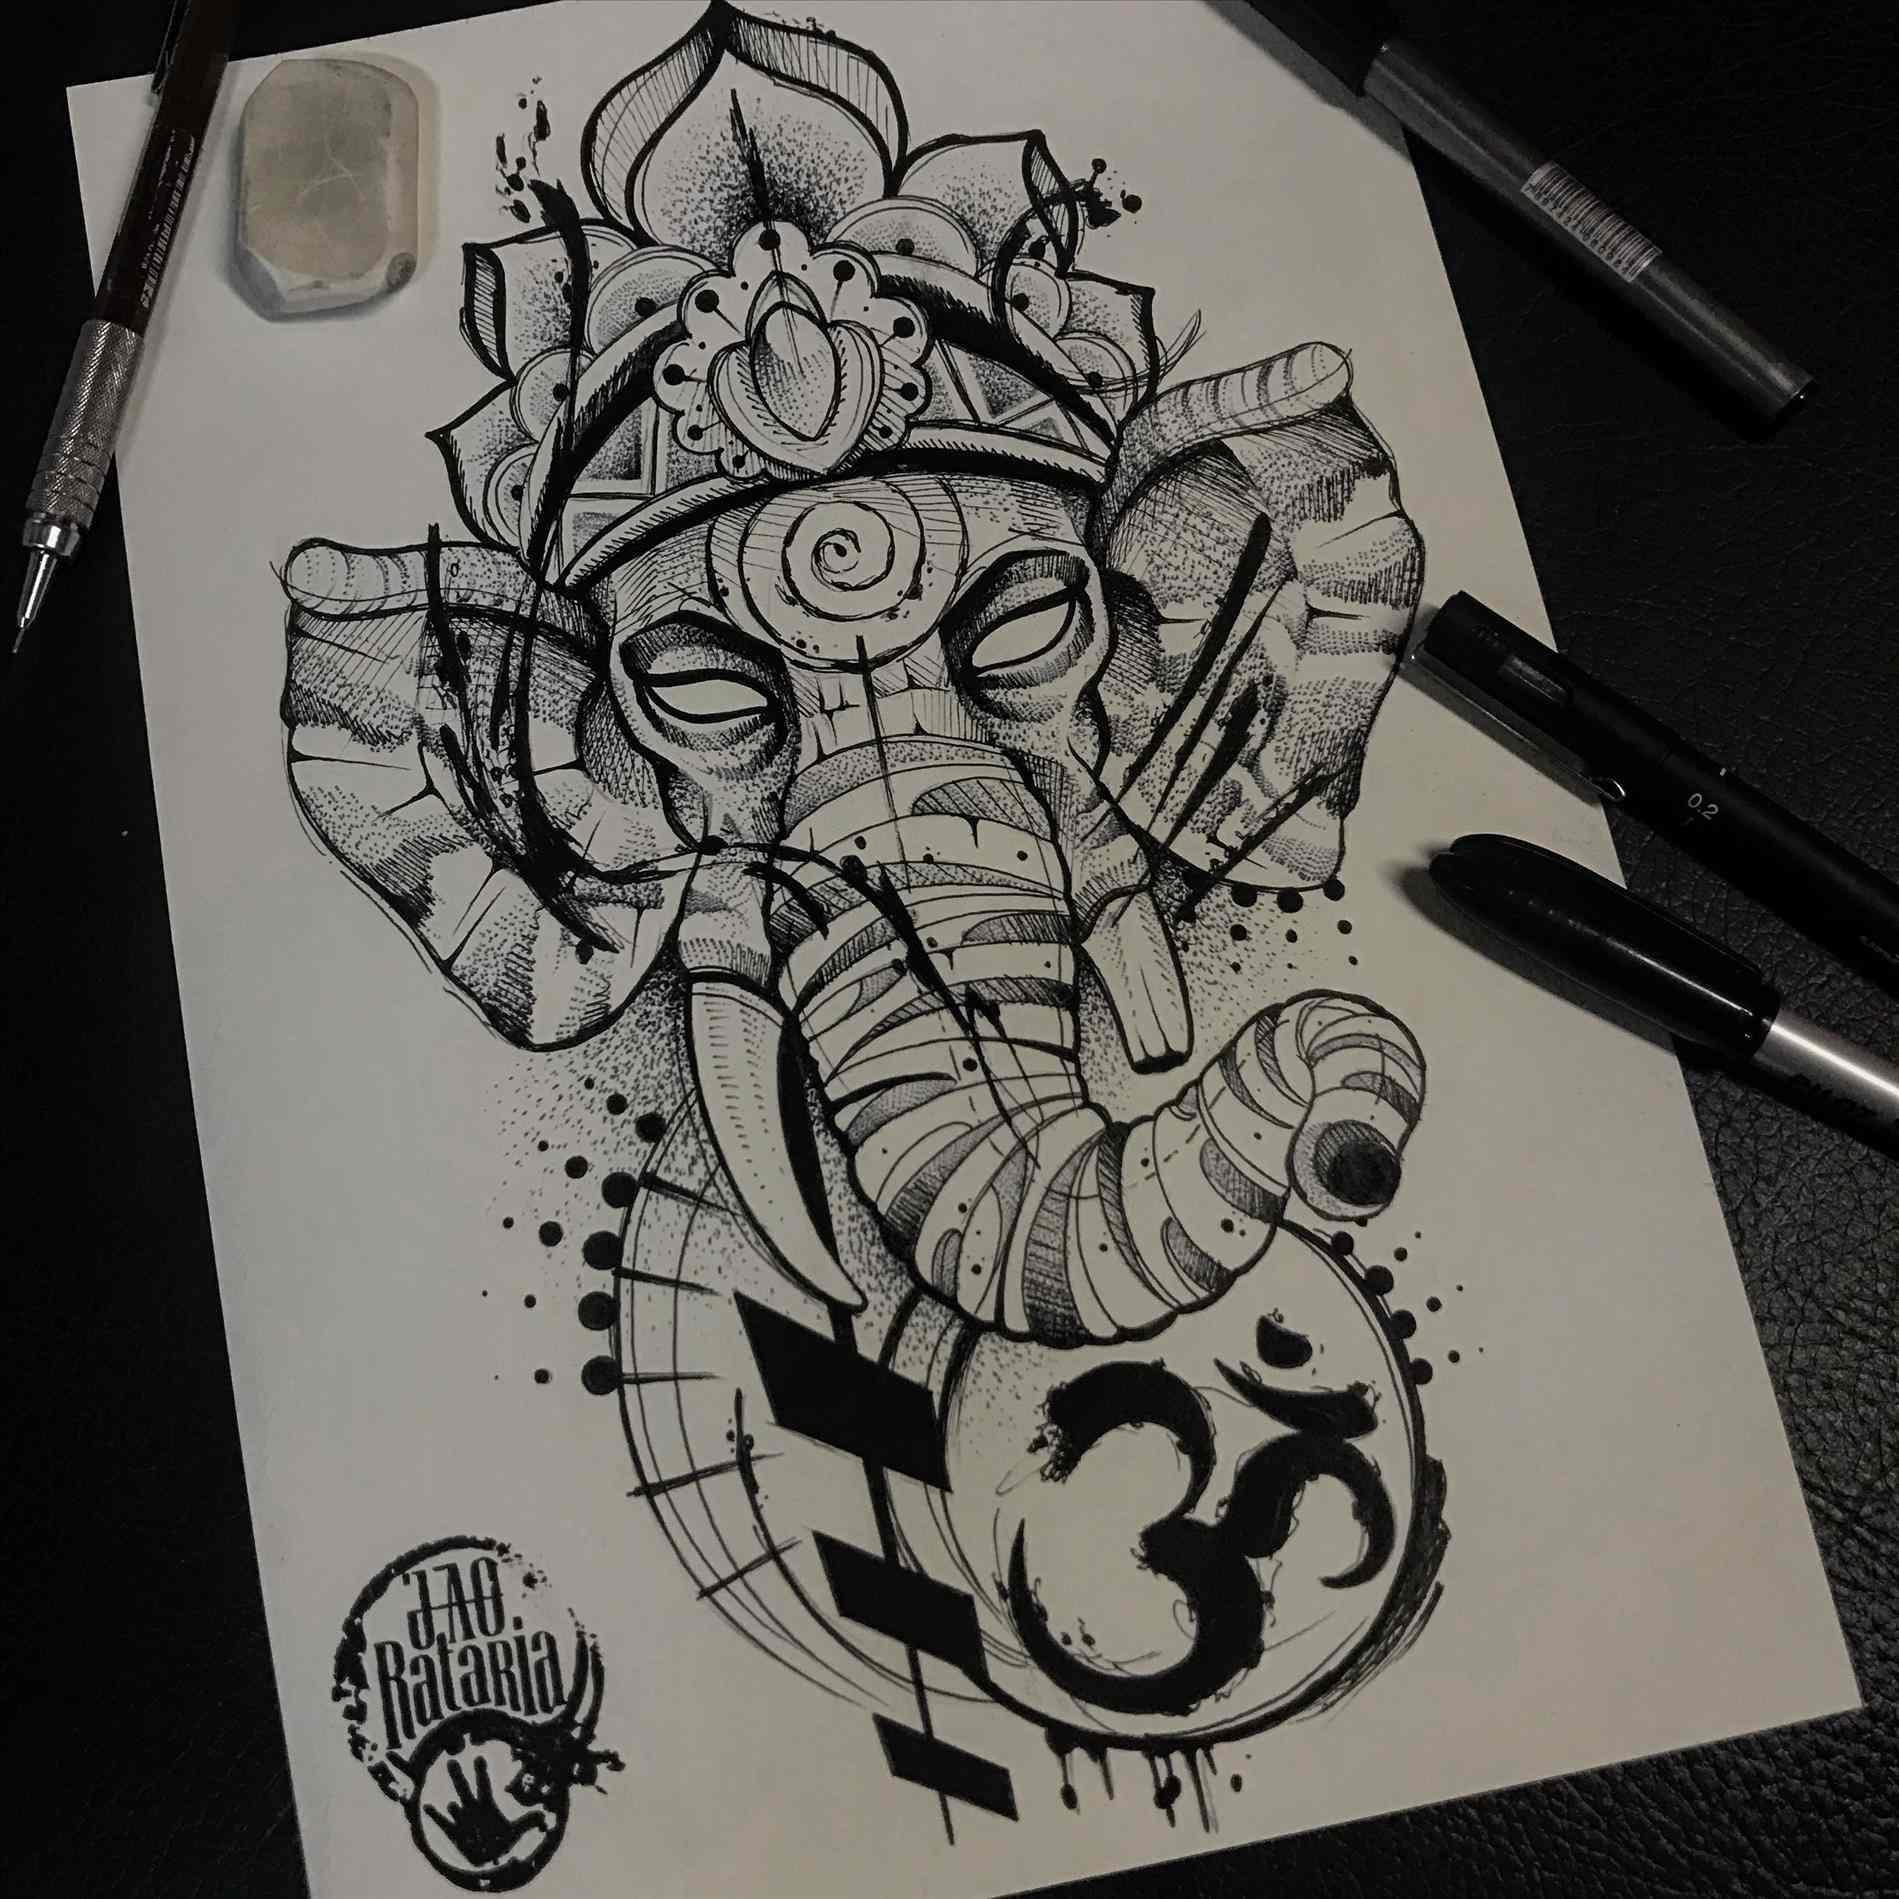 705a9e746 1899x1899 Homme Tribal U Pinteresu Tatouage Celtic Half Sleeve Tattoo